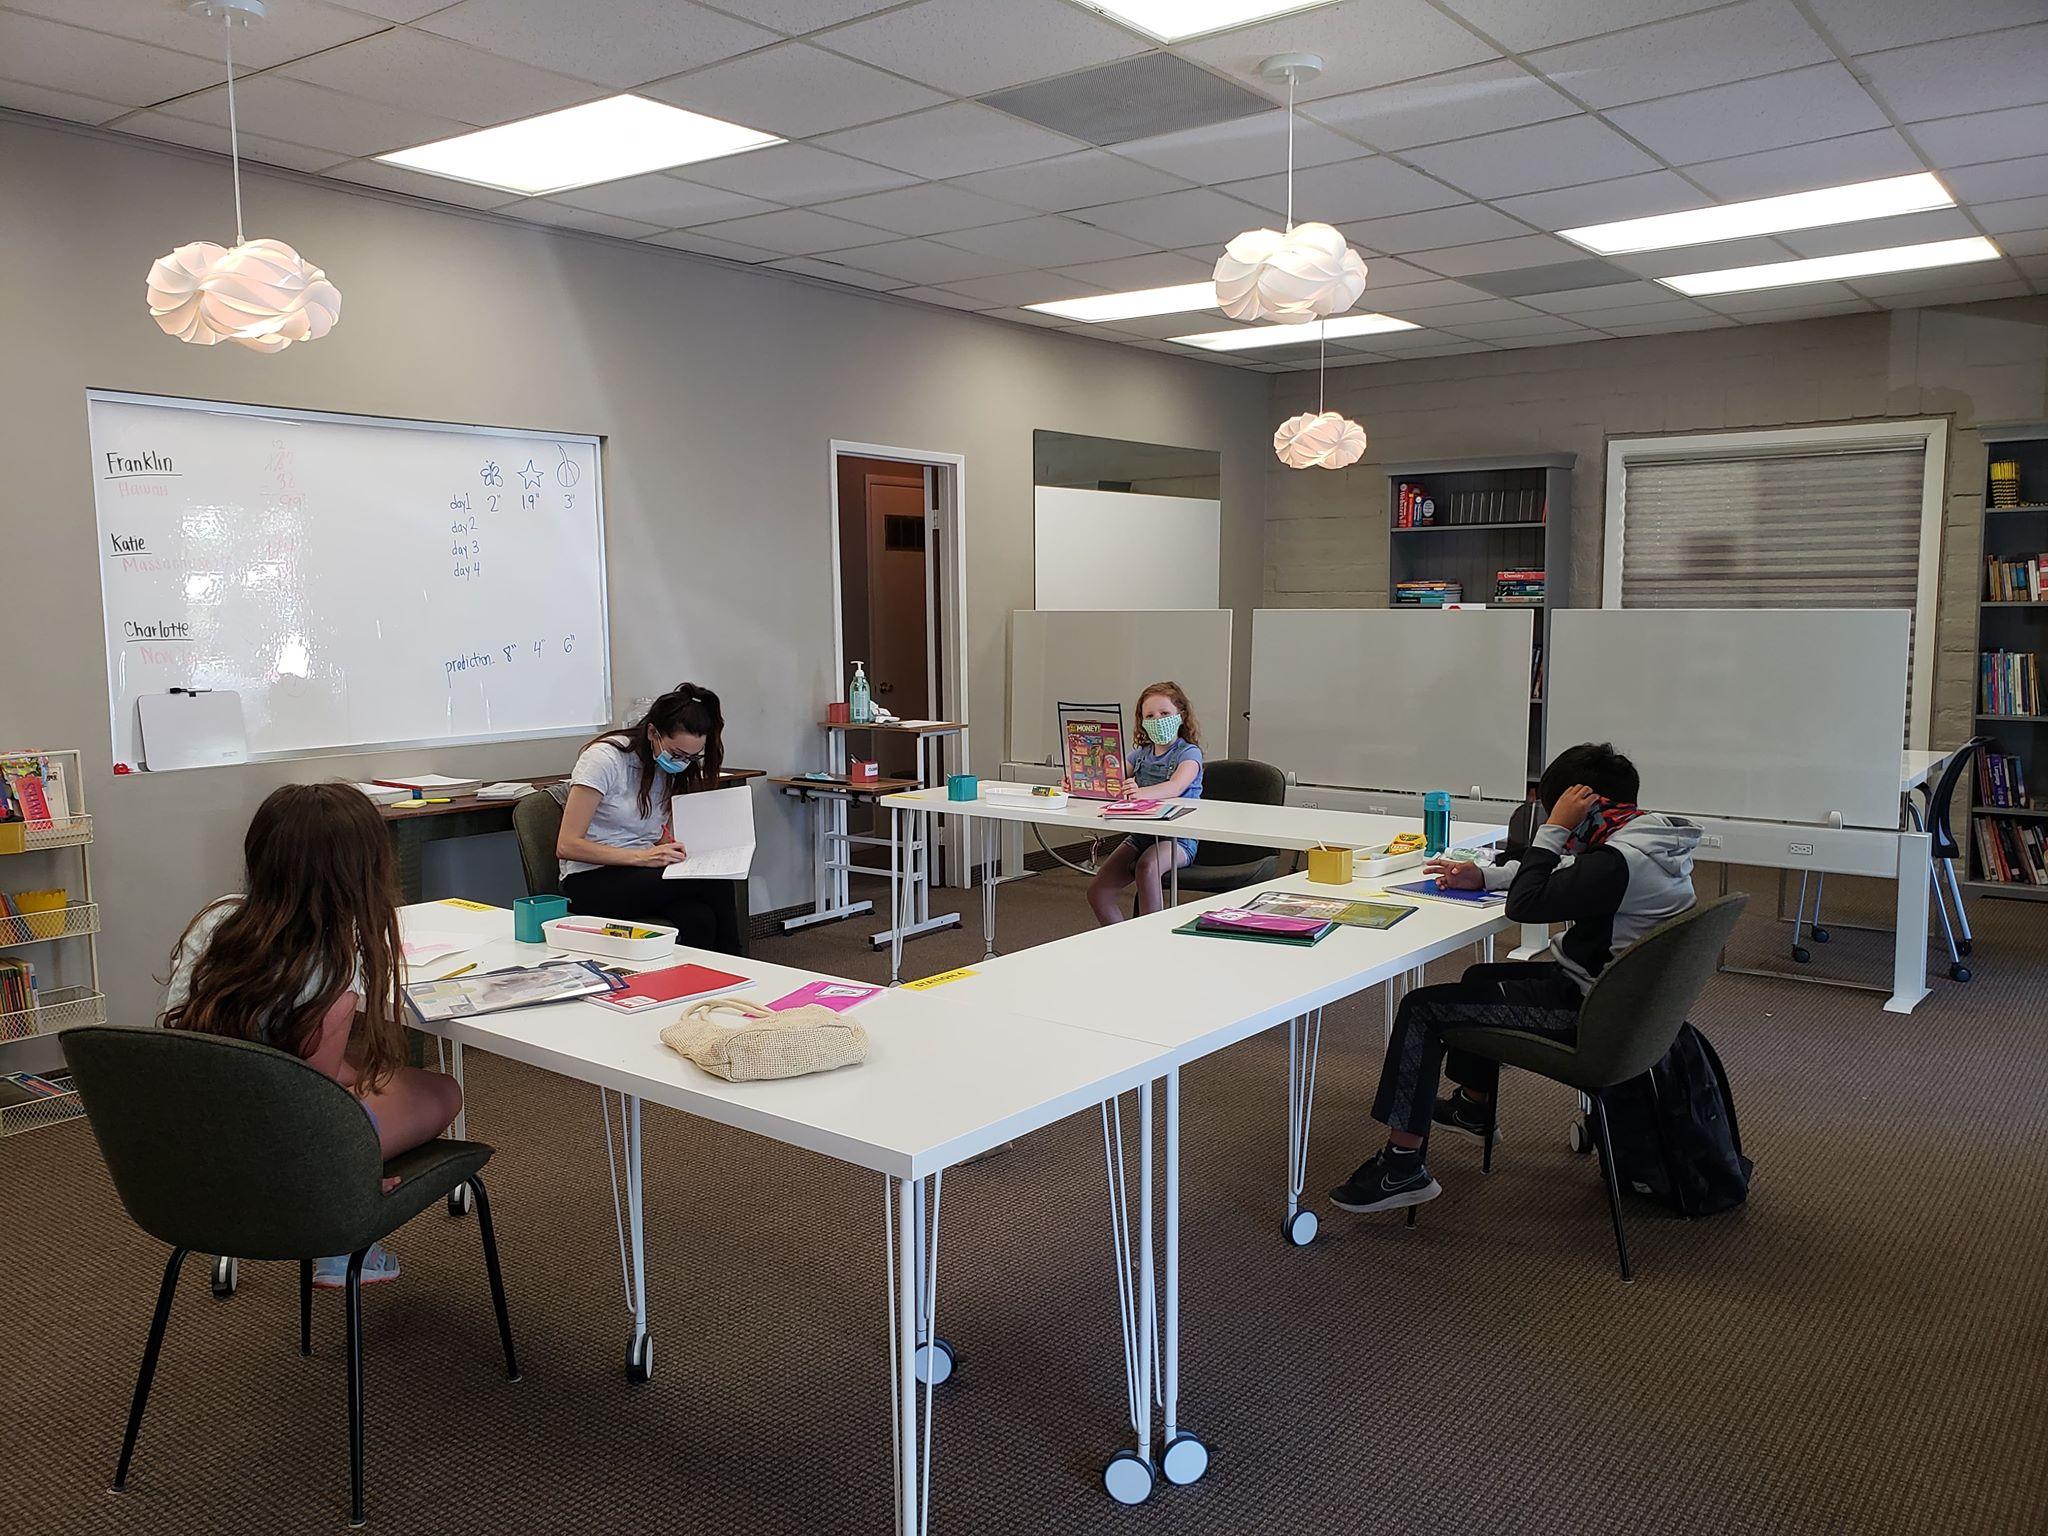 studypage learning